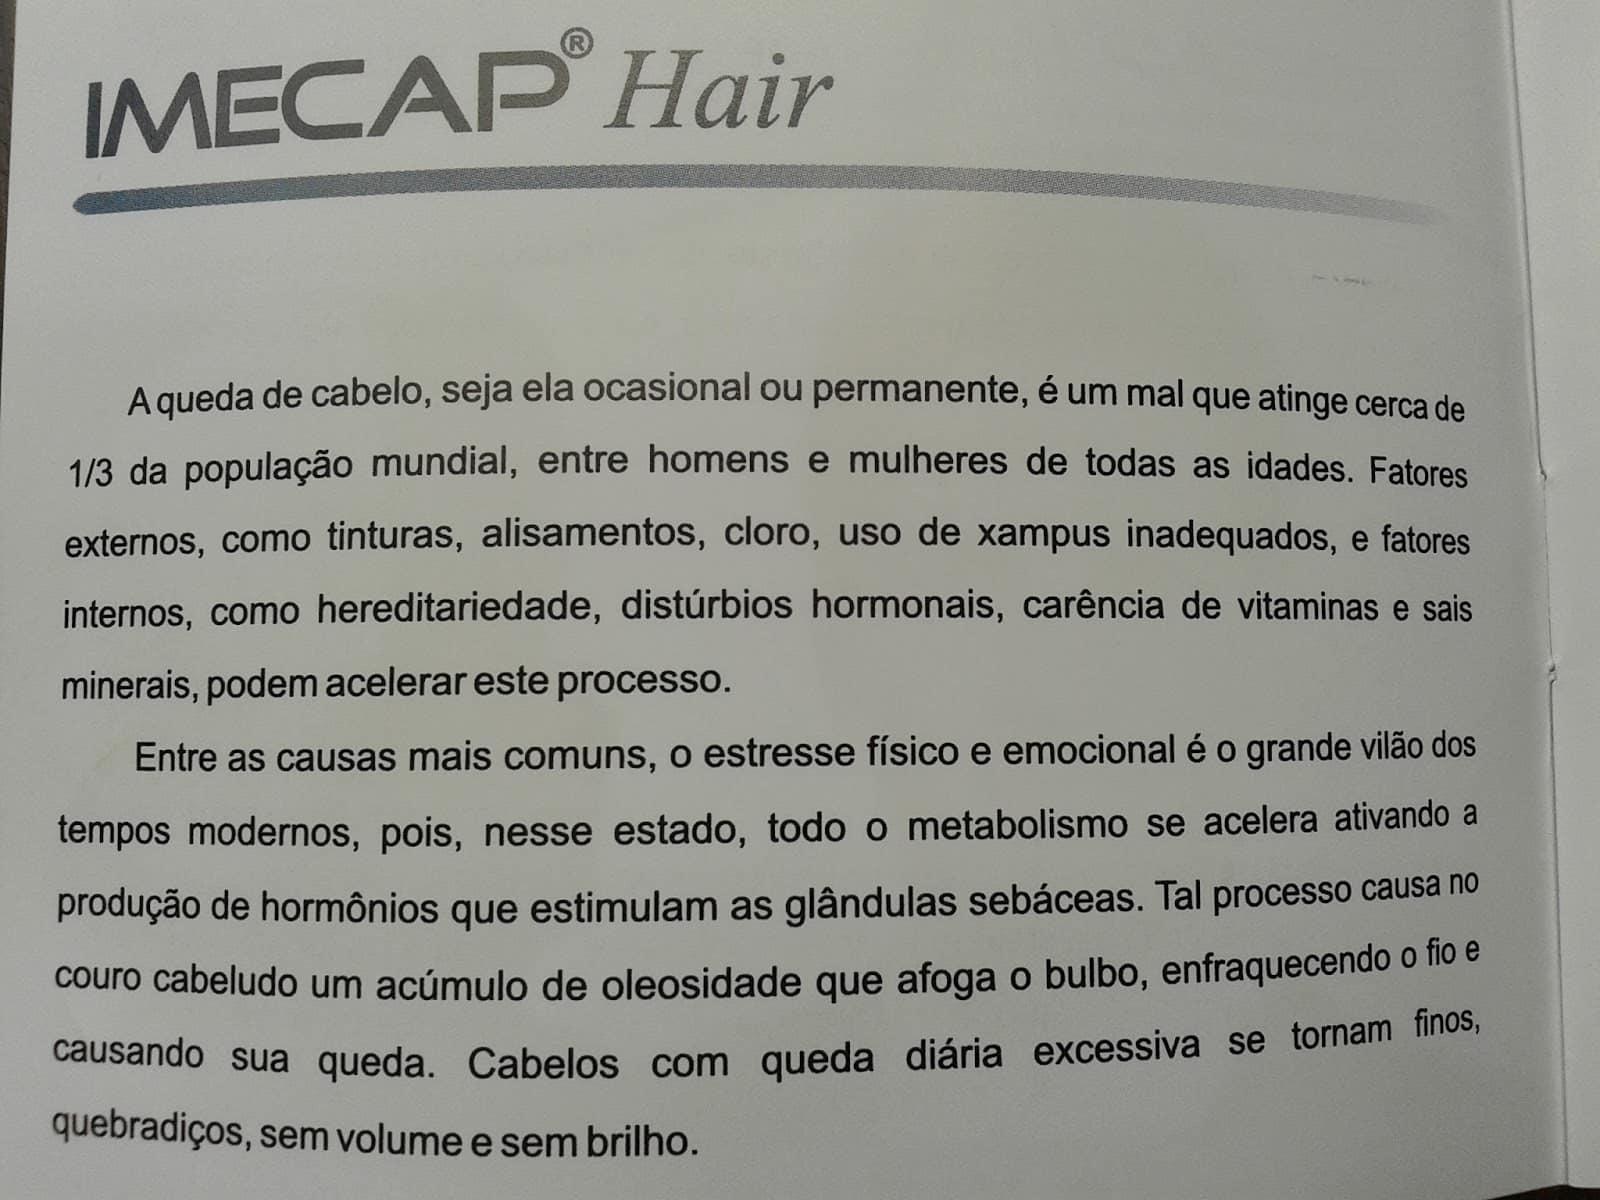 20131230 134956 - Imecap Hair: Como Funciona, Benefícios, Resultados